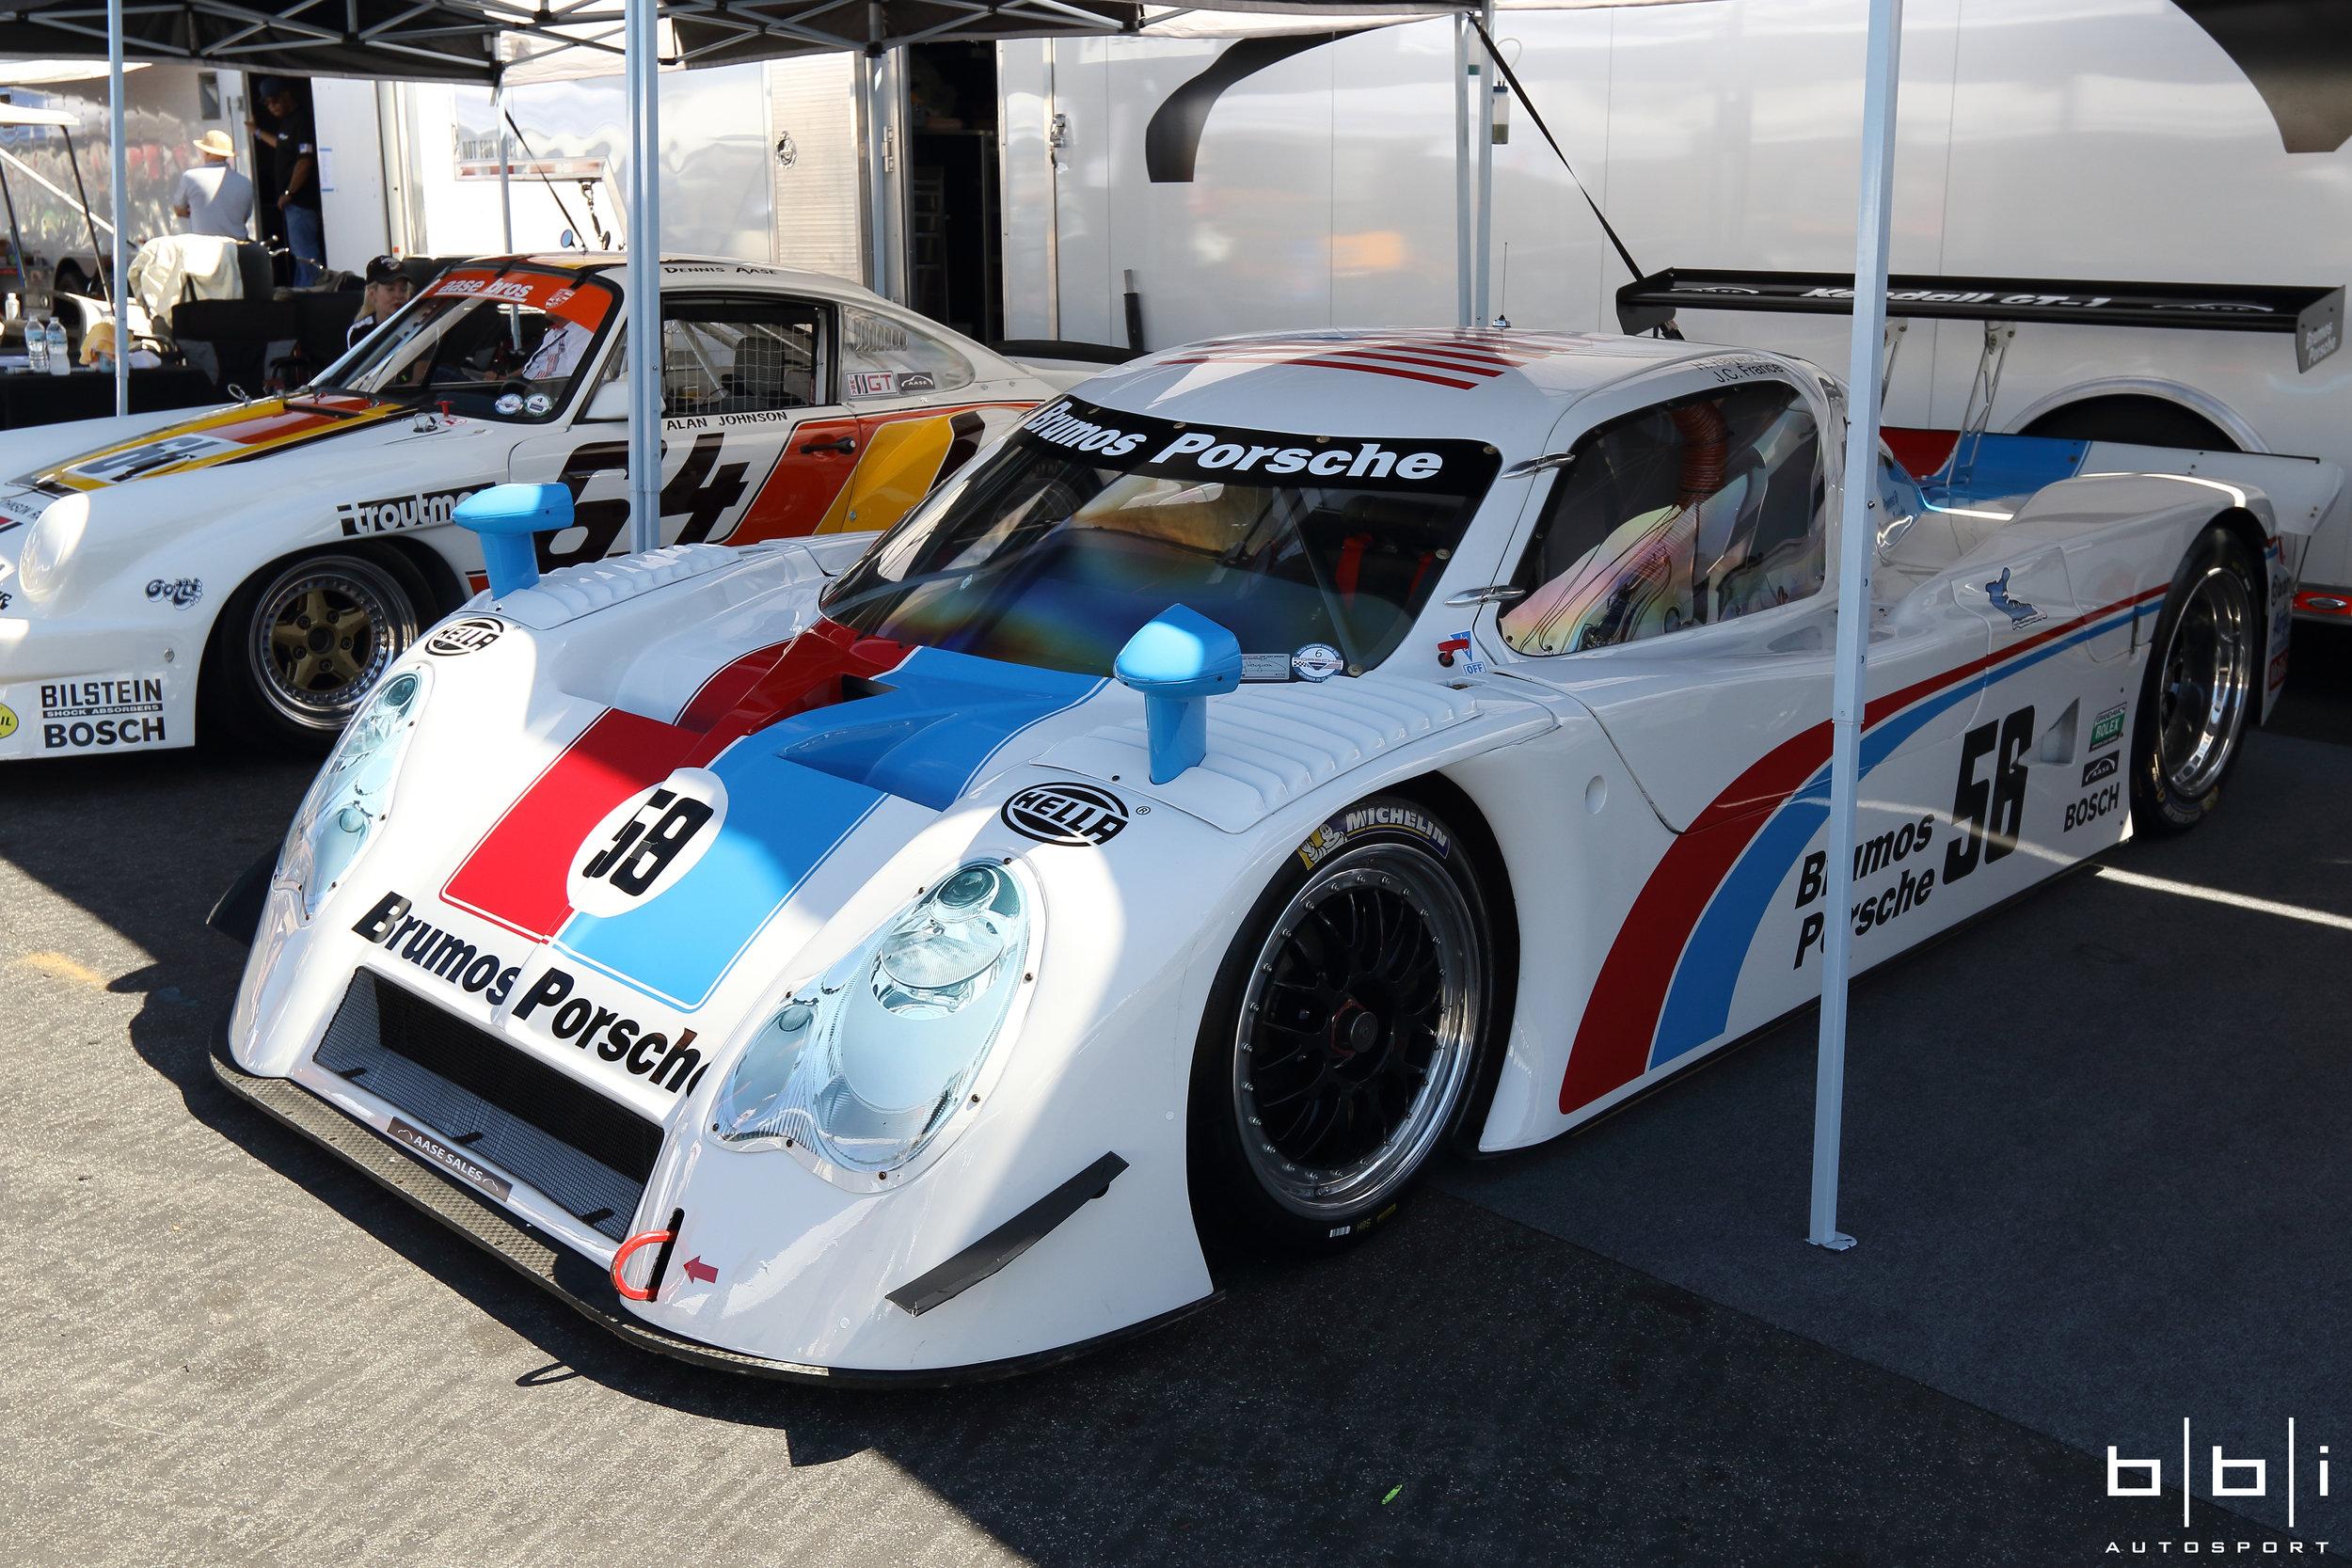 FABCAR-Porsche Daytona Prototype campaigned by Hurley Haywood, J.C. France, Scott Goodyear, and Scott Sharp for Brumos Racing